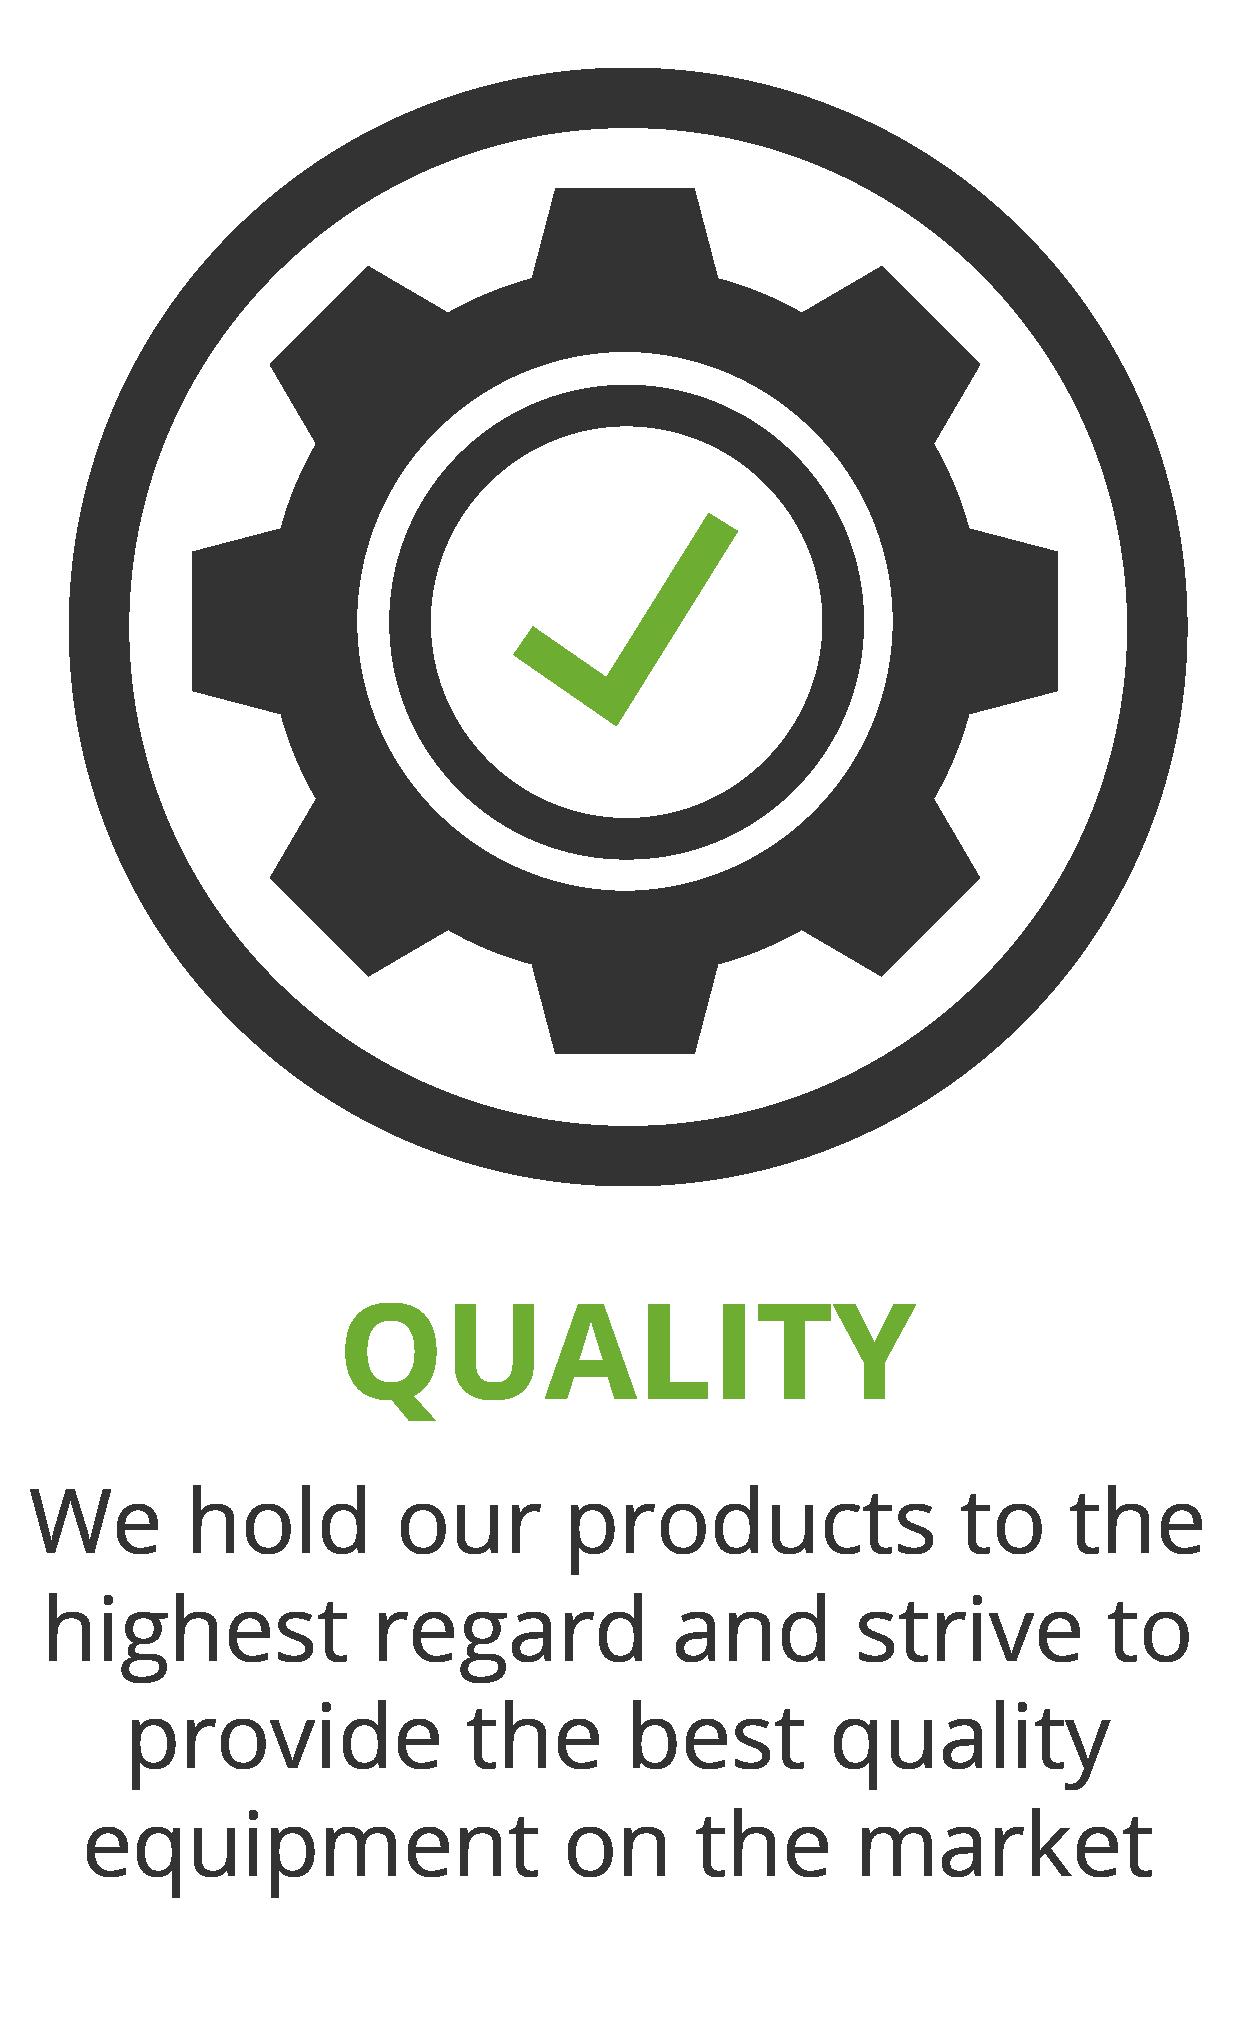 RPM Quality